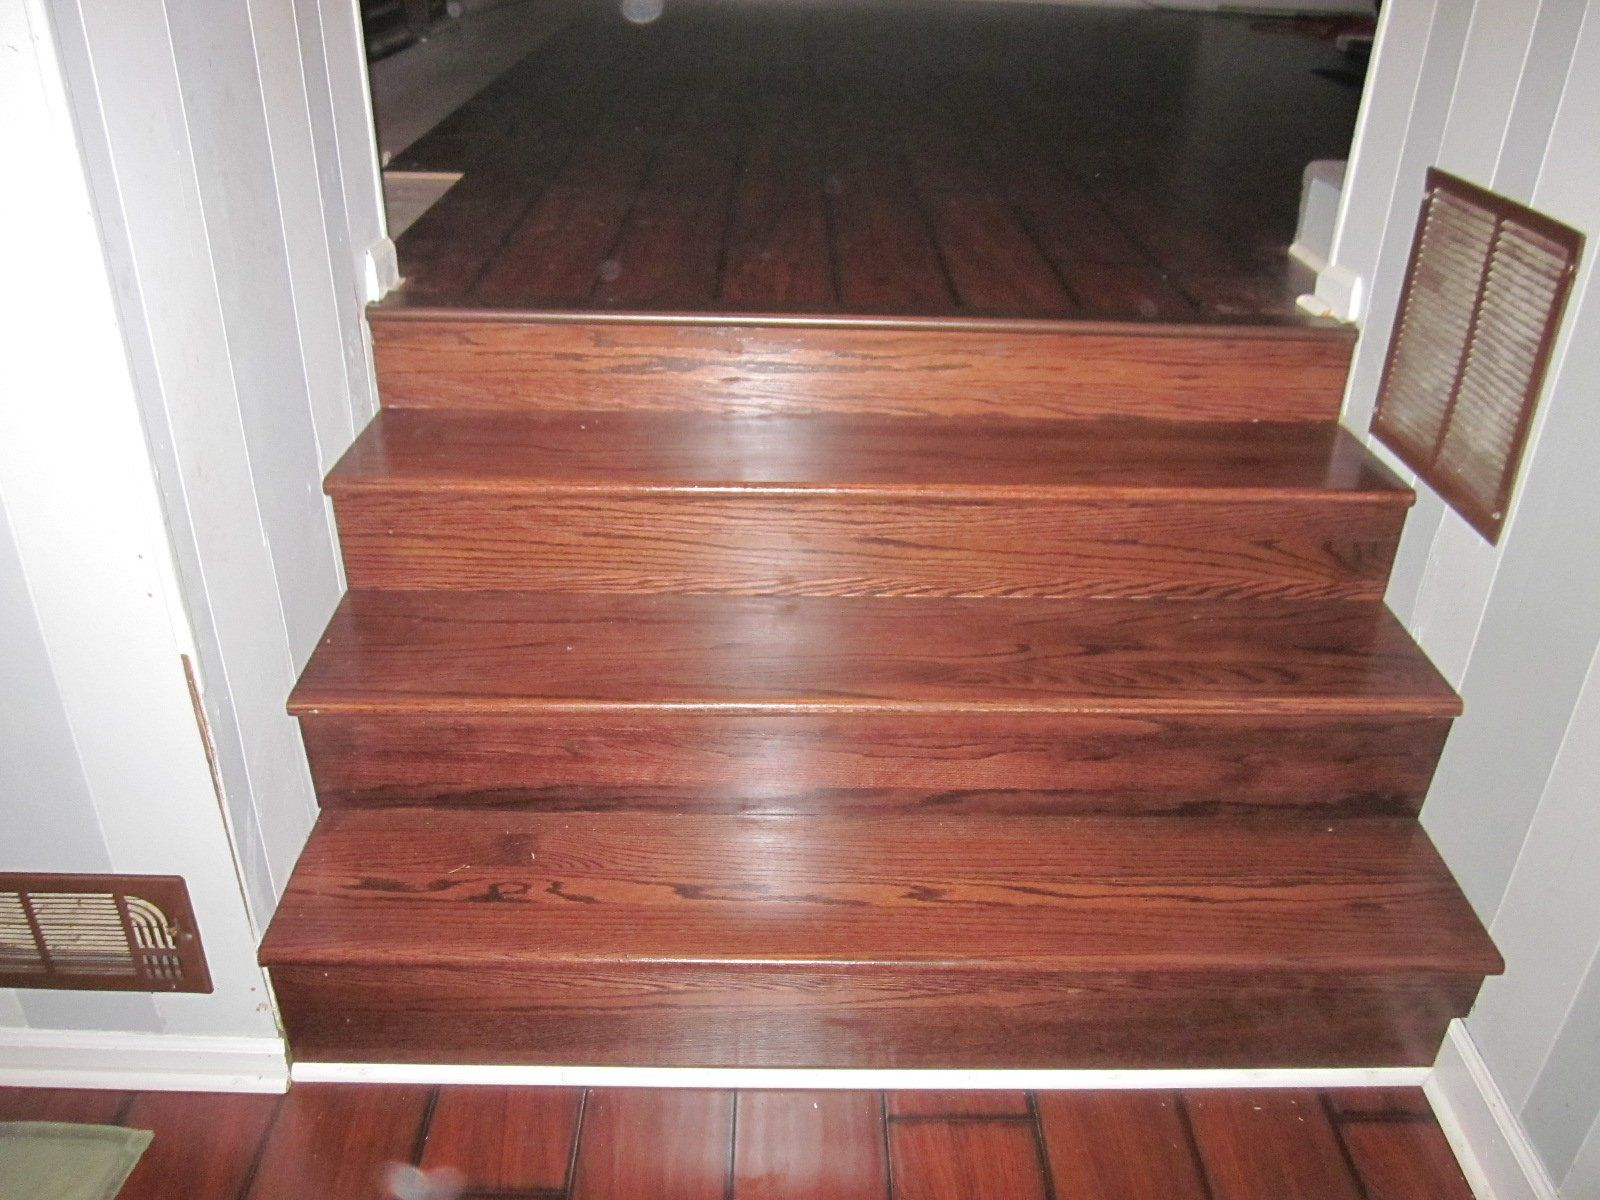 Laminate Flooring Stairs Wood Laminate stairs, Laminate